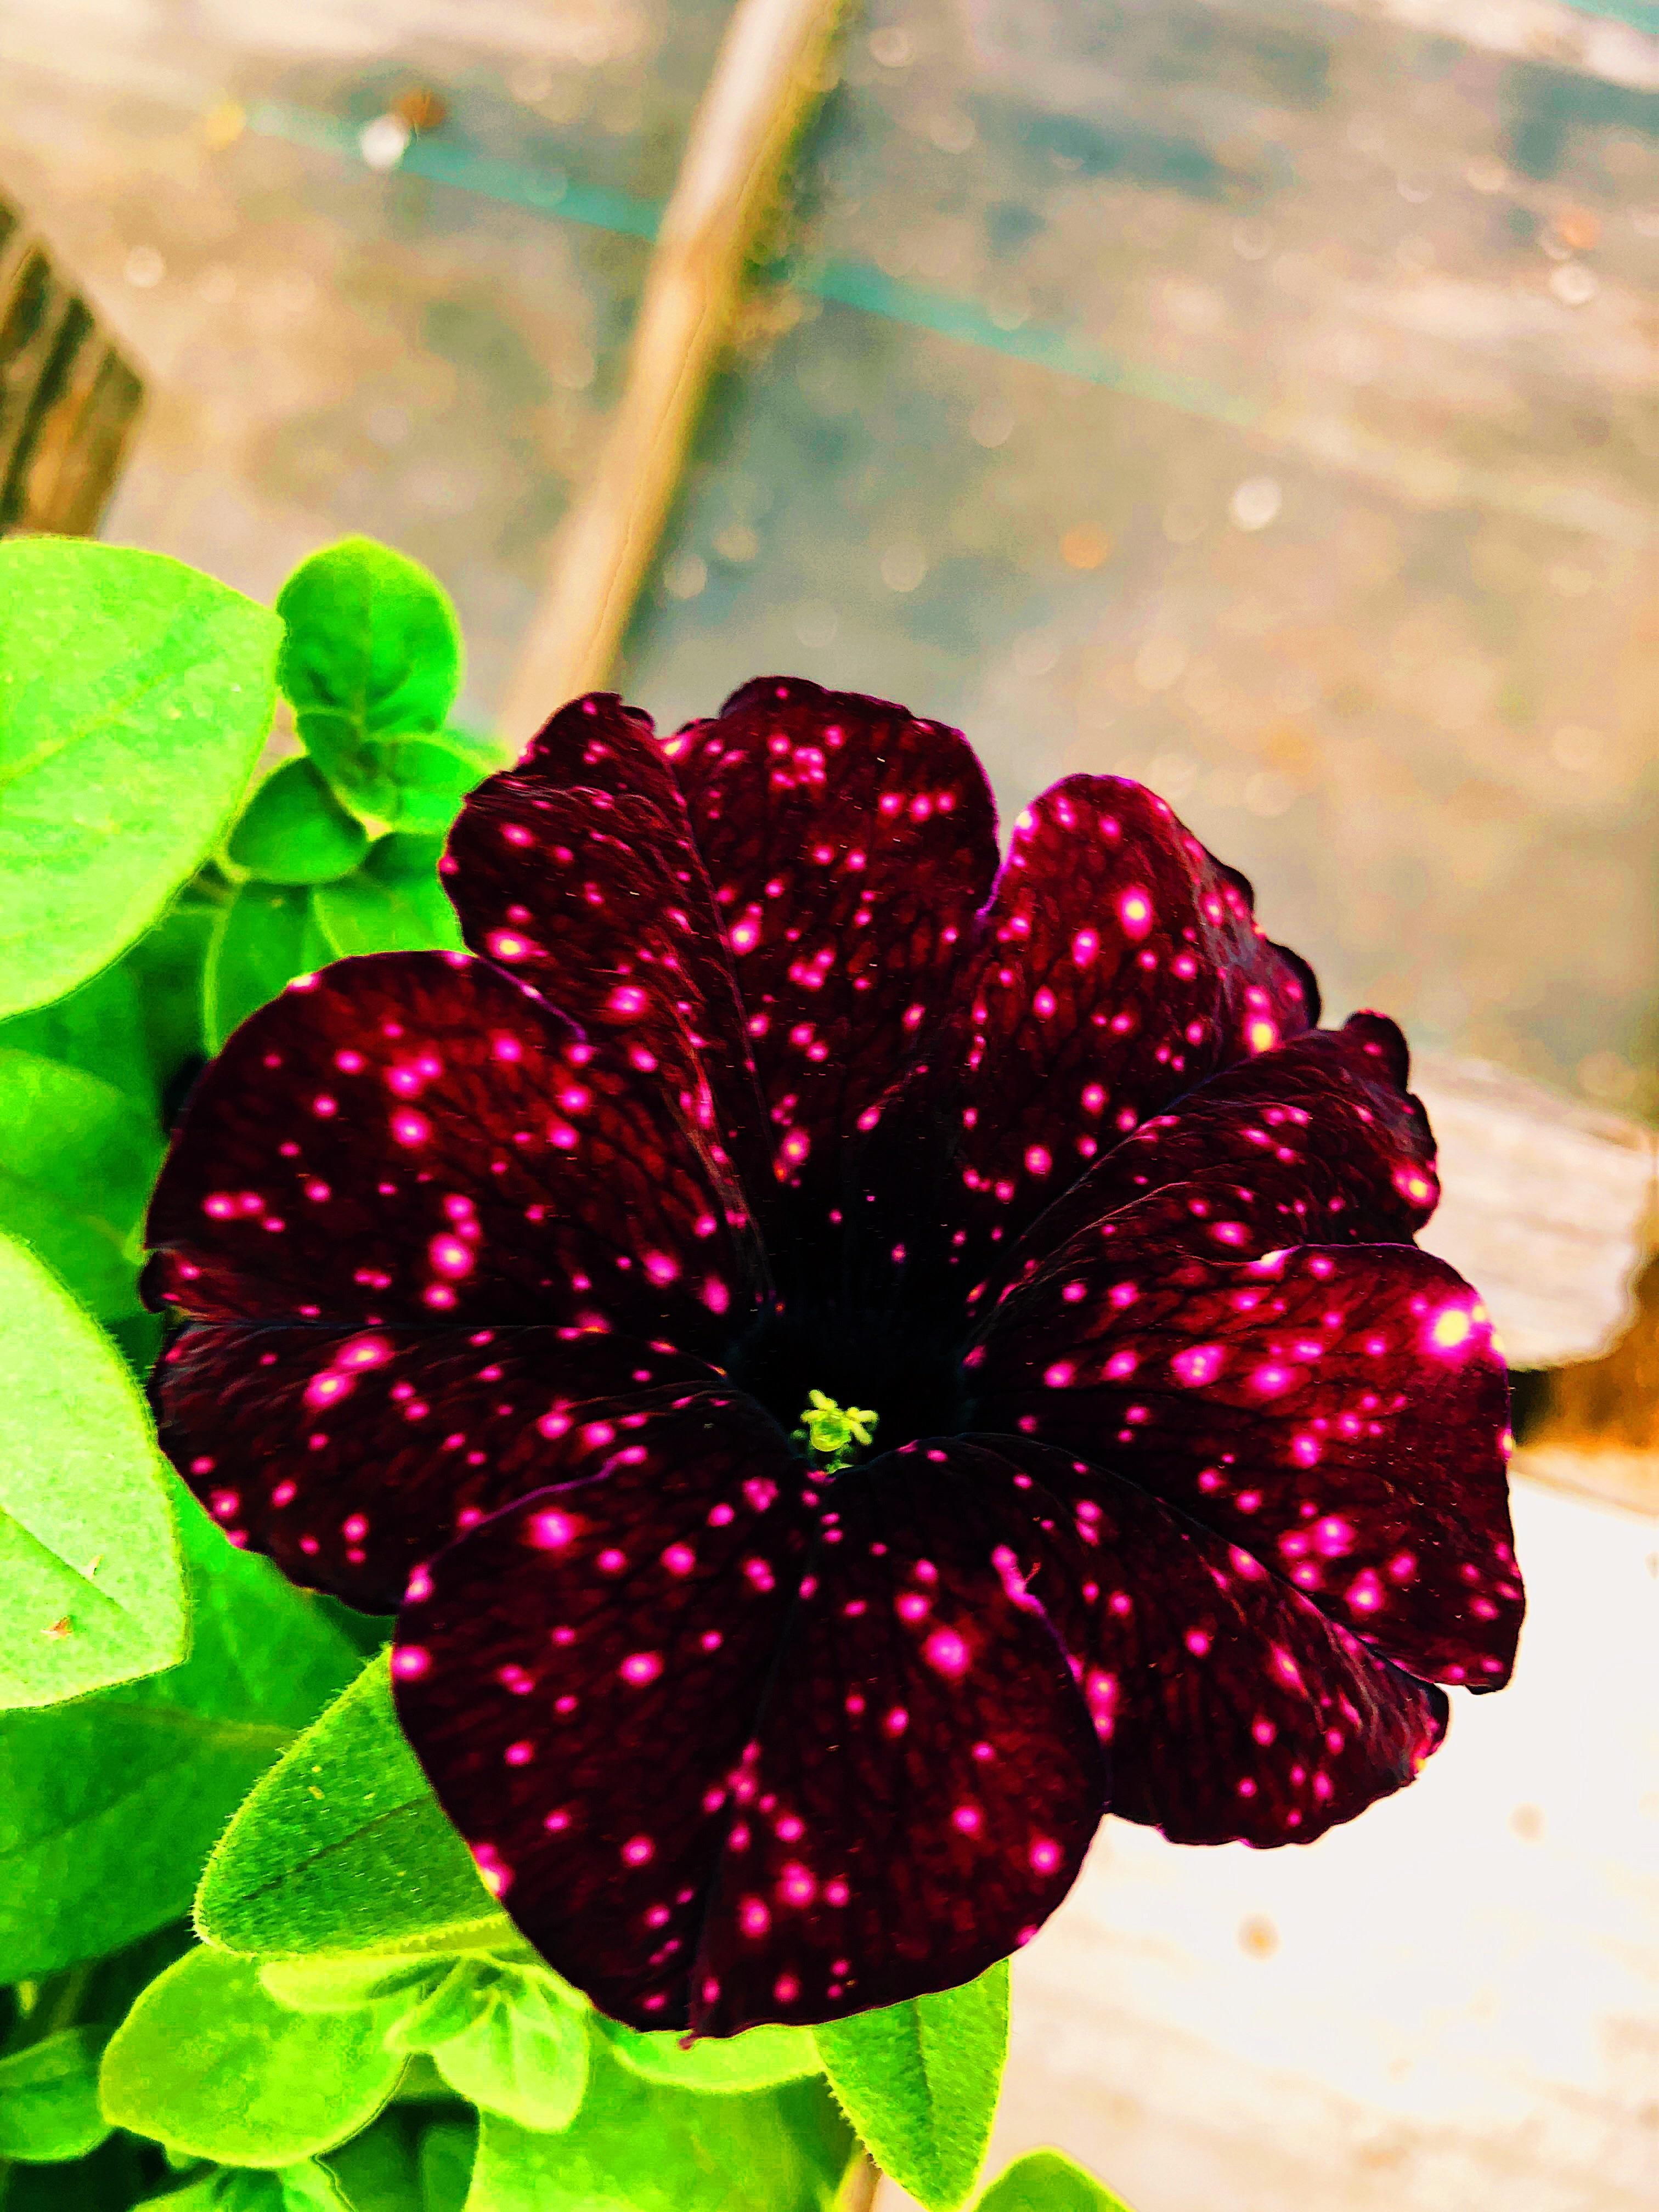 Pin By Photodesignger On Outdoors In 2020 Petunia Flower Petunias Rare Flowers